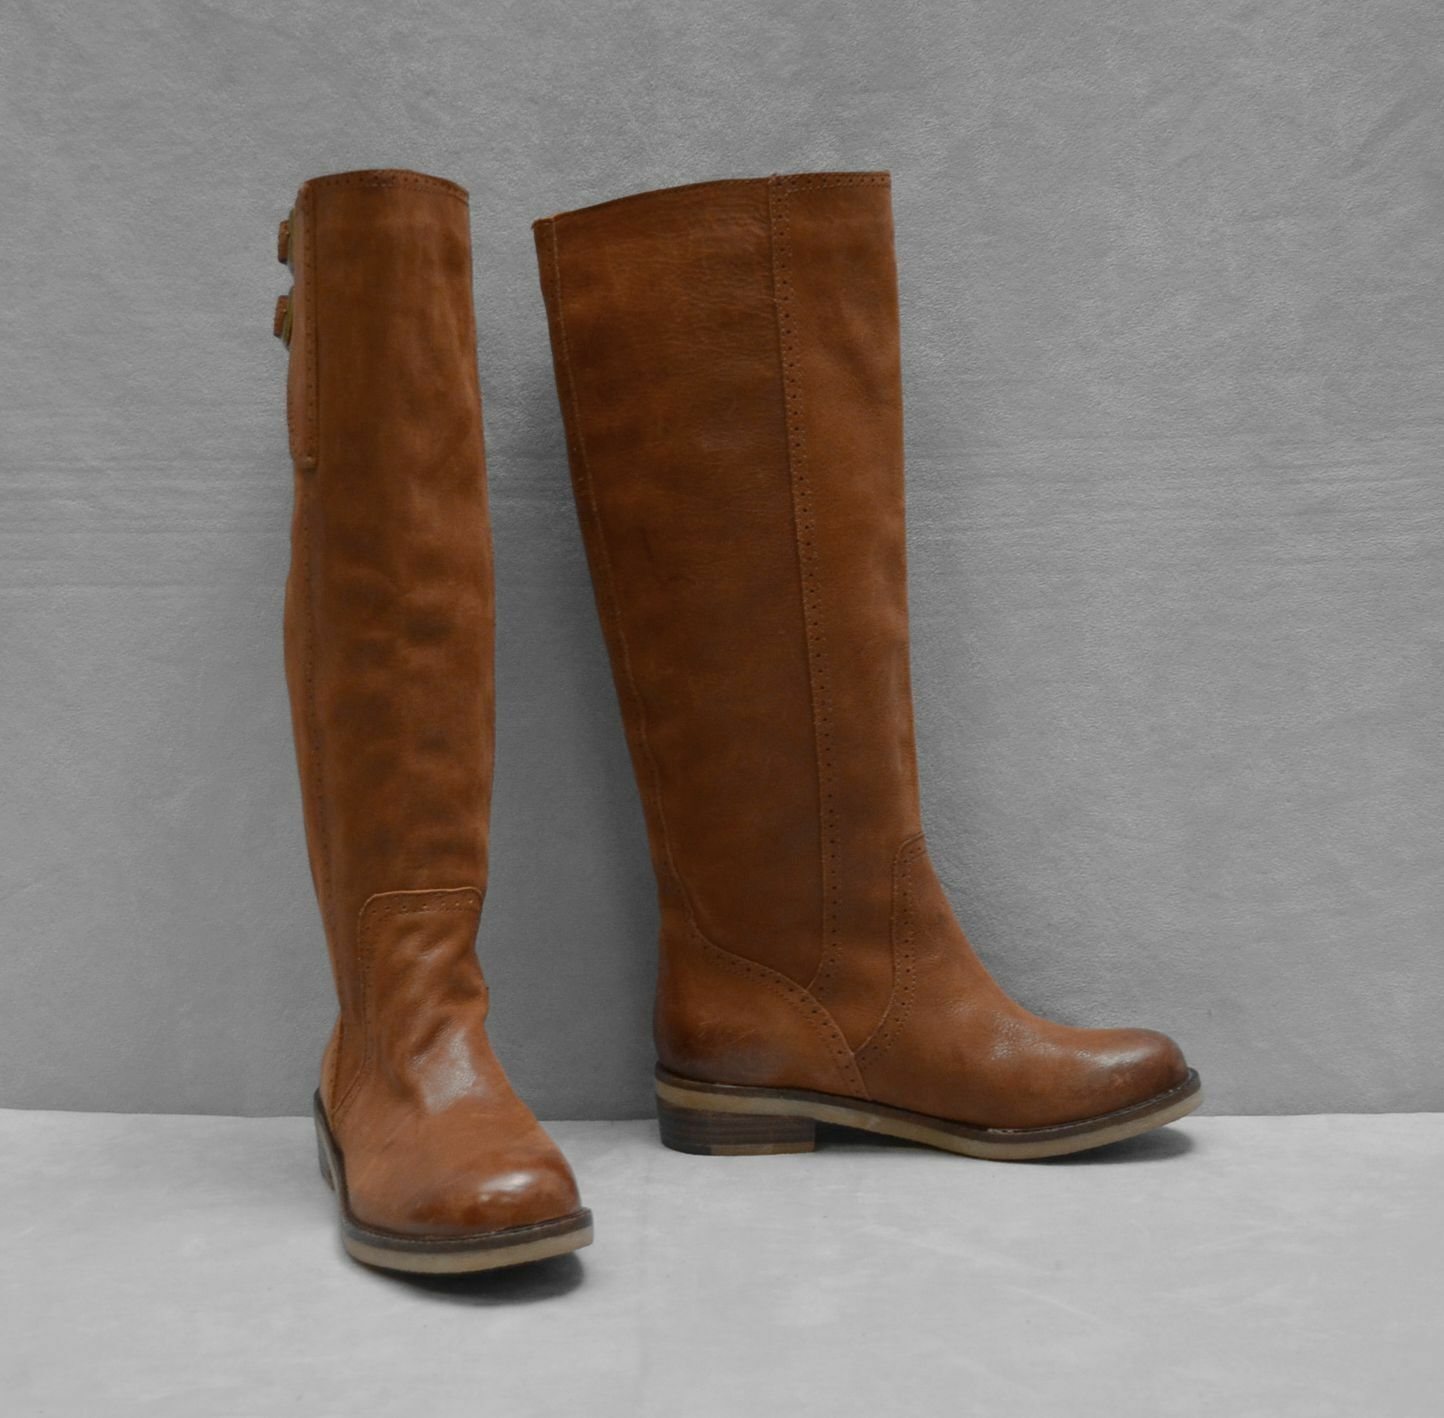 B0 NEU LUCKY BRAND Braun Leder Double Buckle Strap Knee Hi Boot Schuhes Sz 5.5 M